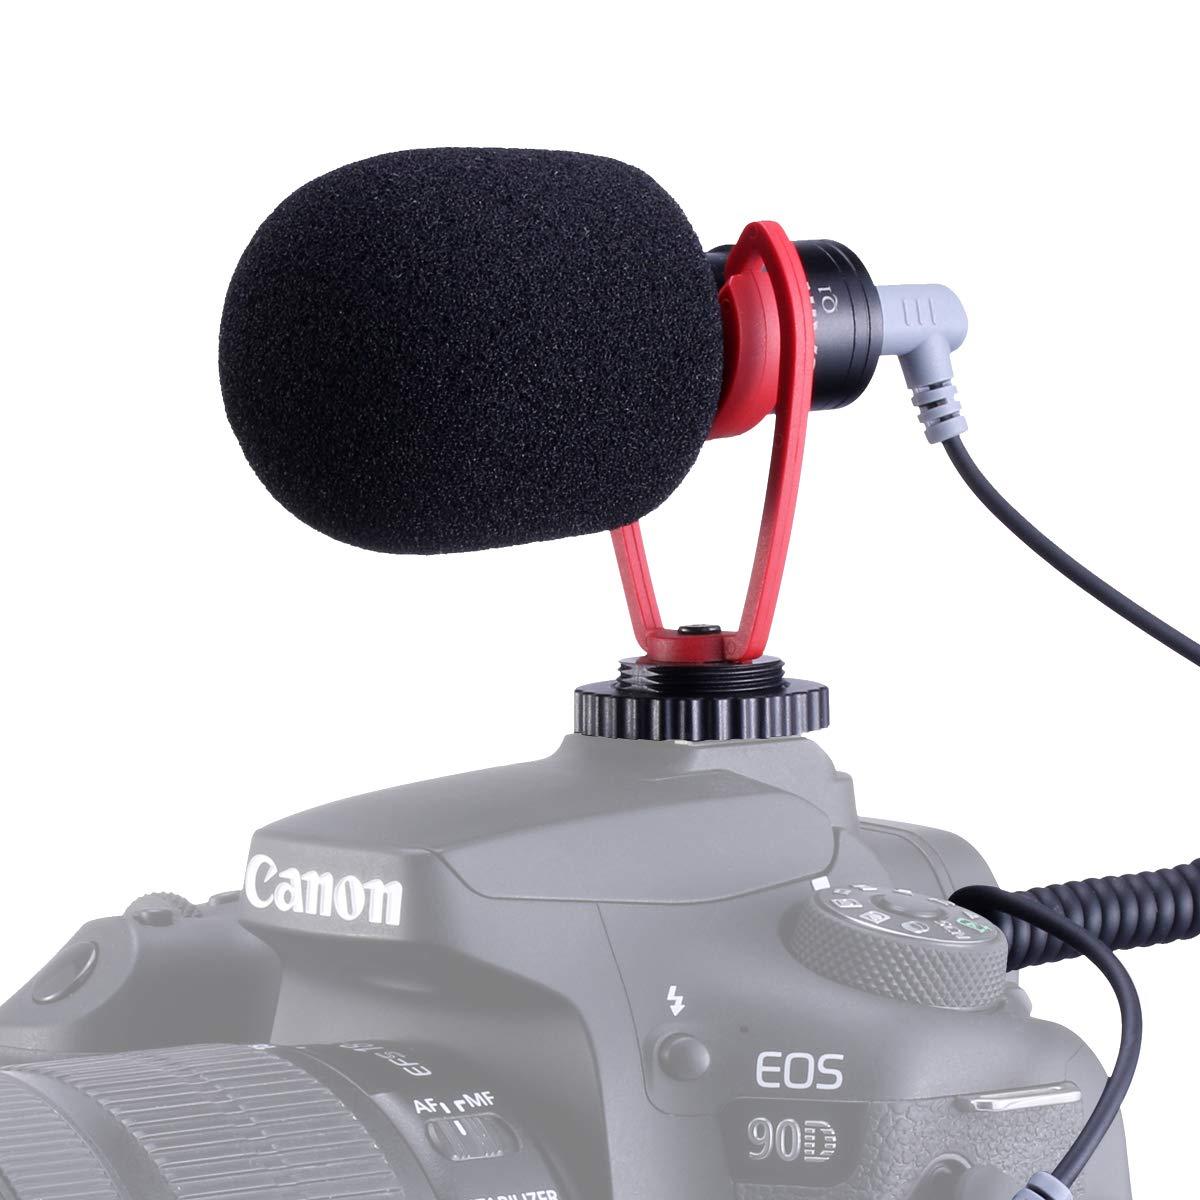 SAIREN VM-Q1 Shotgun Video Microphone, Compact On-Camera Recording Mic, with Shock Mount DeadCat Windscreen, Universal for iPhone Samsung Smartphone; Sony/Canon/Nikon Camera; DJI OSMO Mobile 3 Gimbal